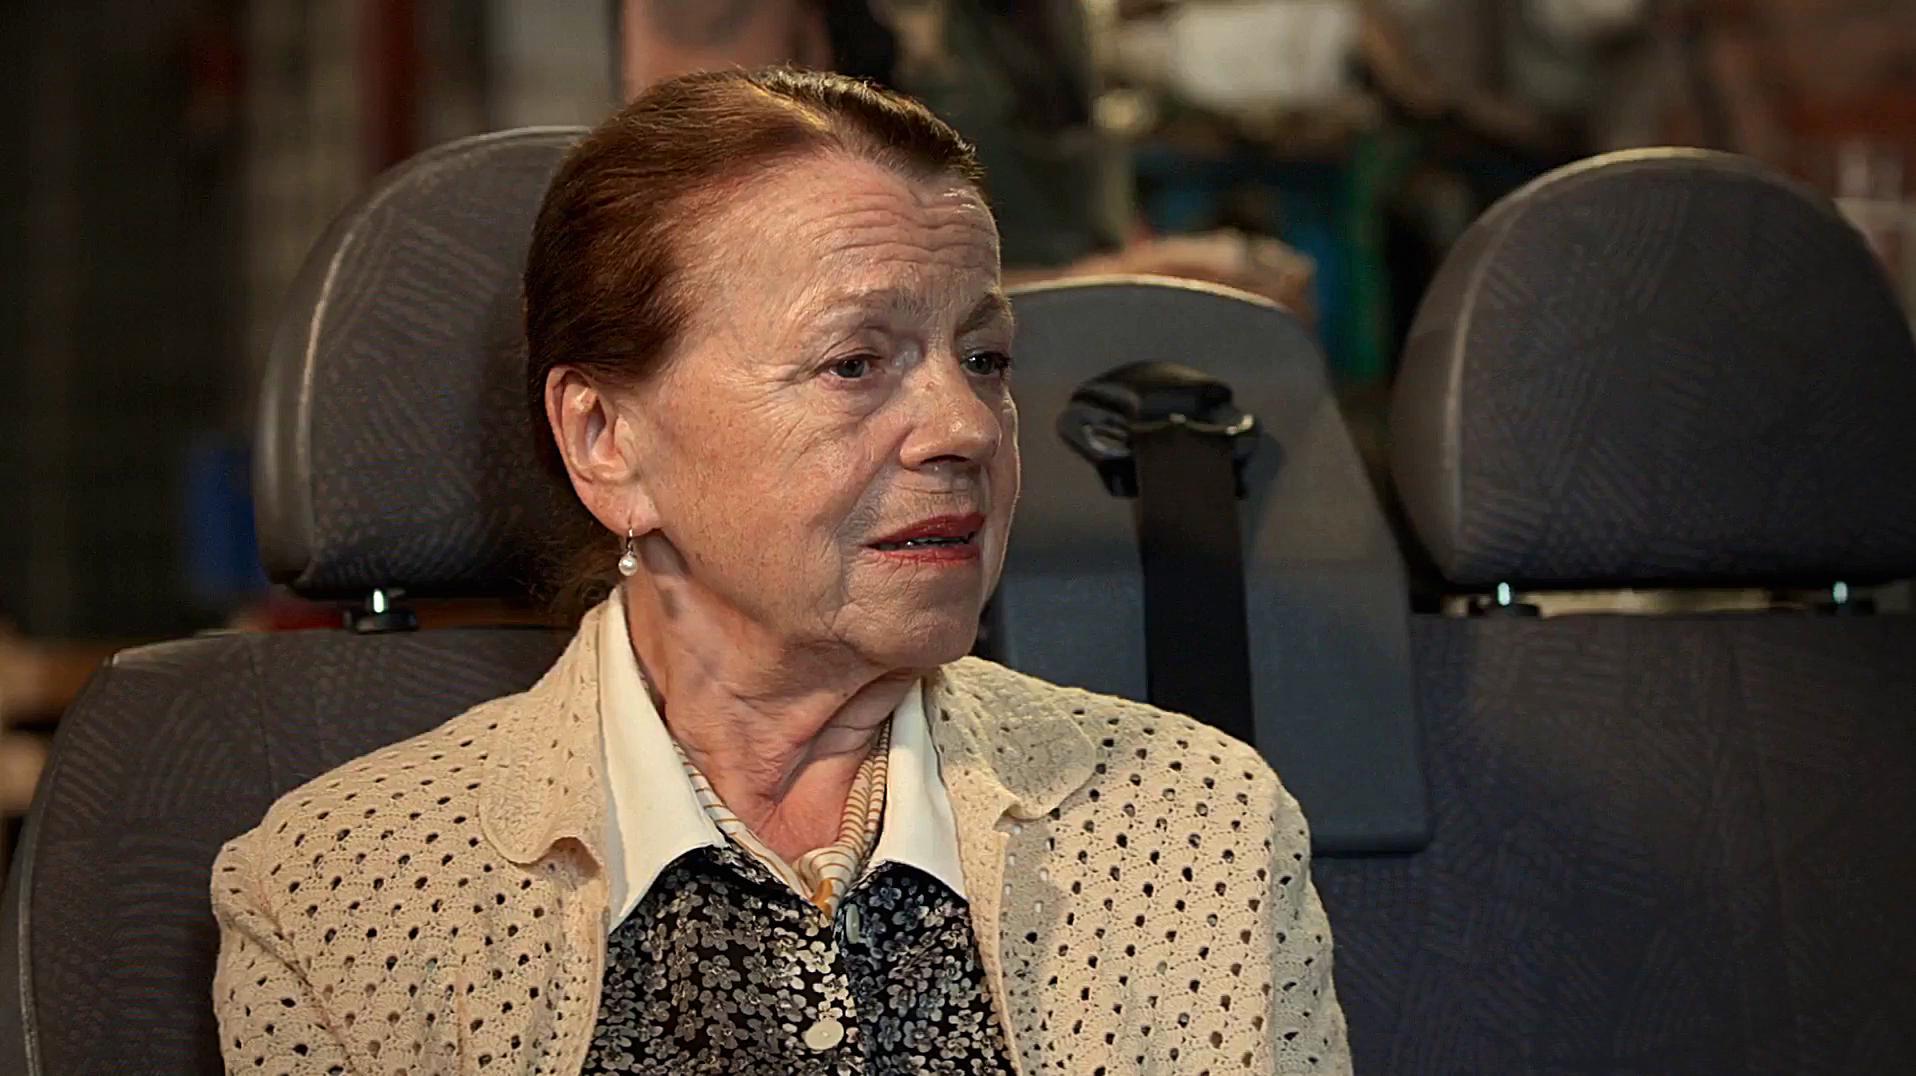 Iva Janzurová in Teroristka (2019)